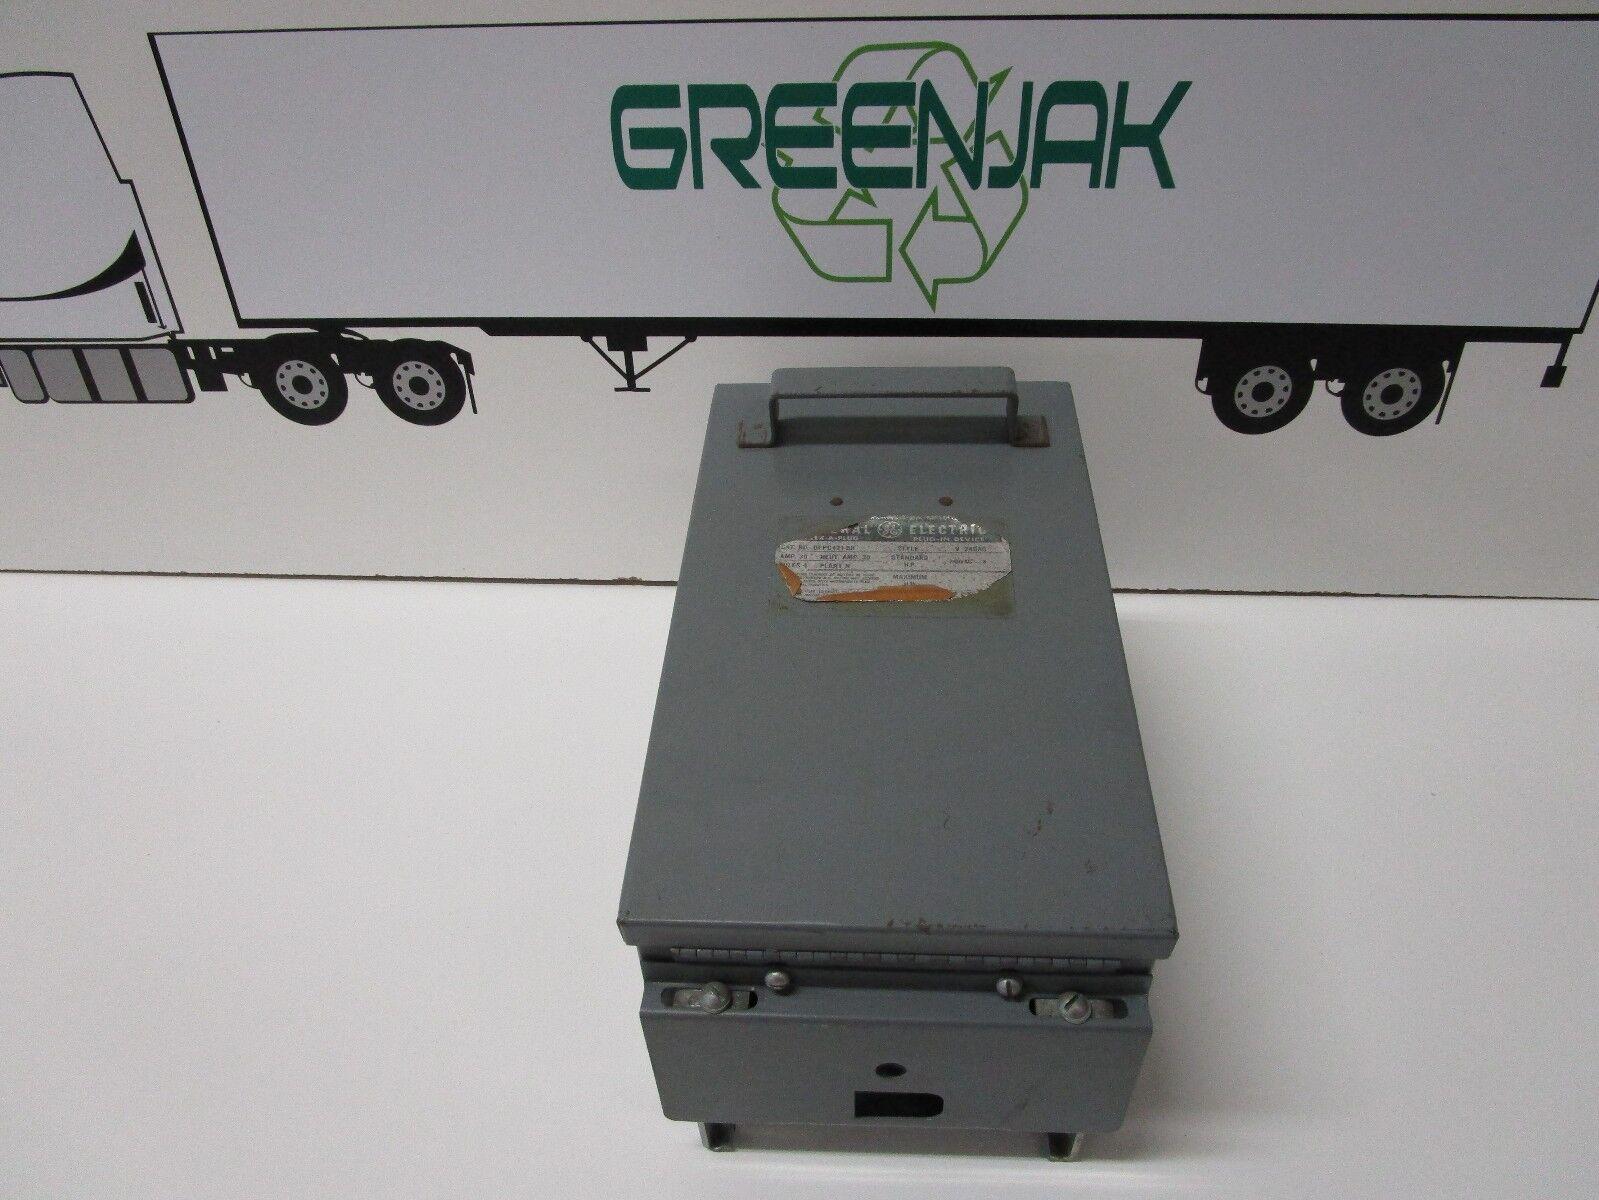 GENERAL ELECTRIC DFPC421DH 30A 240V 4-POLE FLEX-A-PLUG SWITCH - USED - FREE SHIP